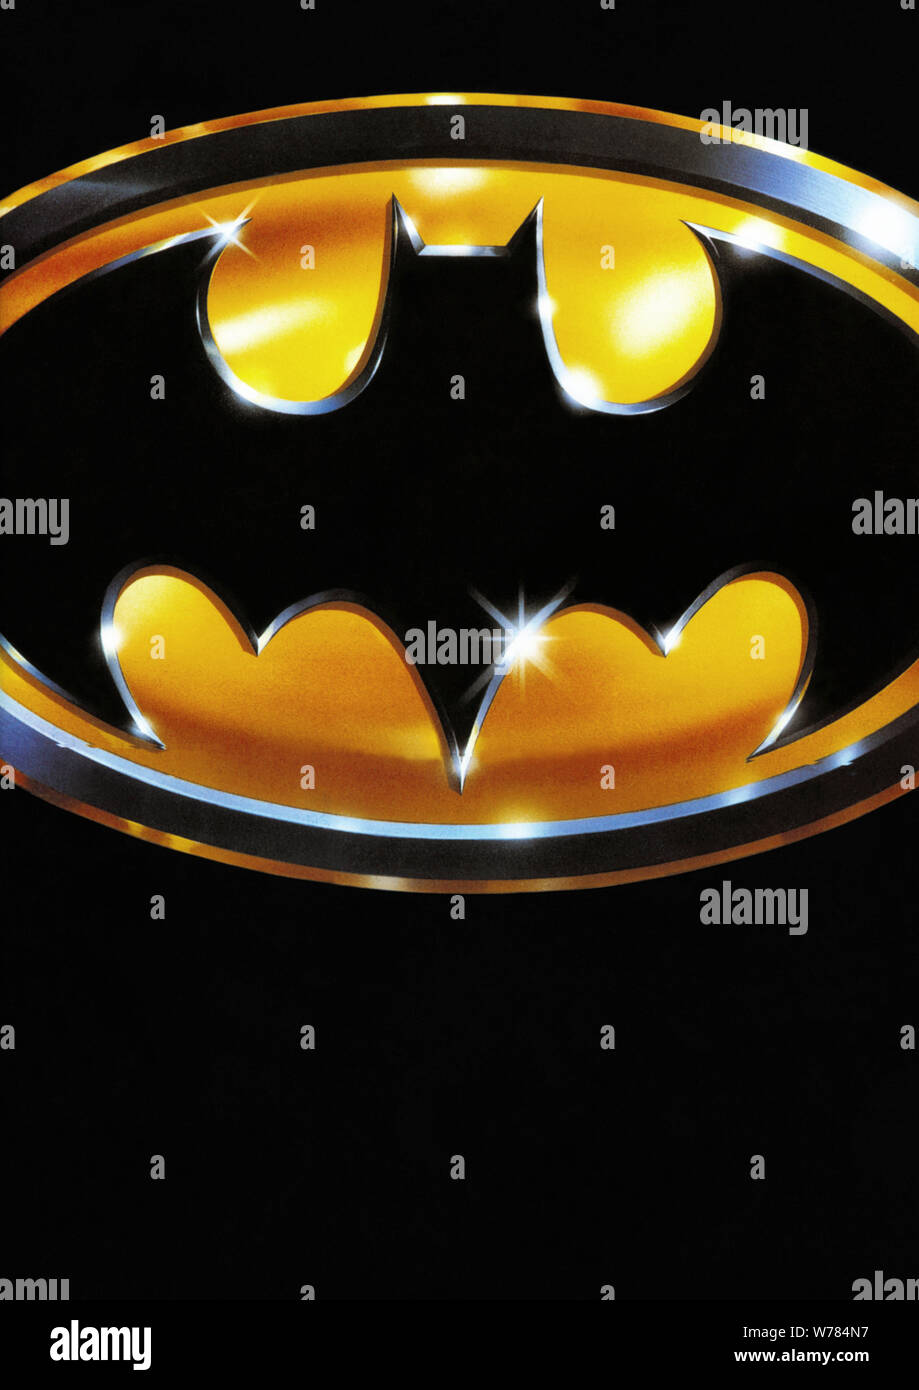 Batman Logo Batman 1989 Stock Photo Alamy